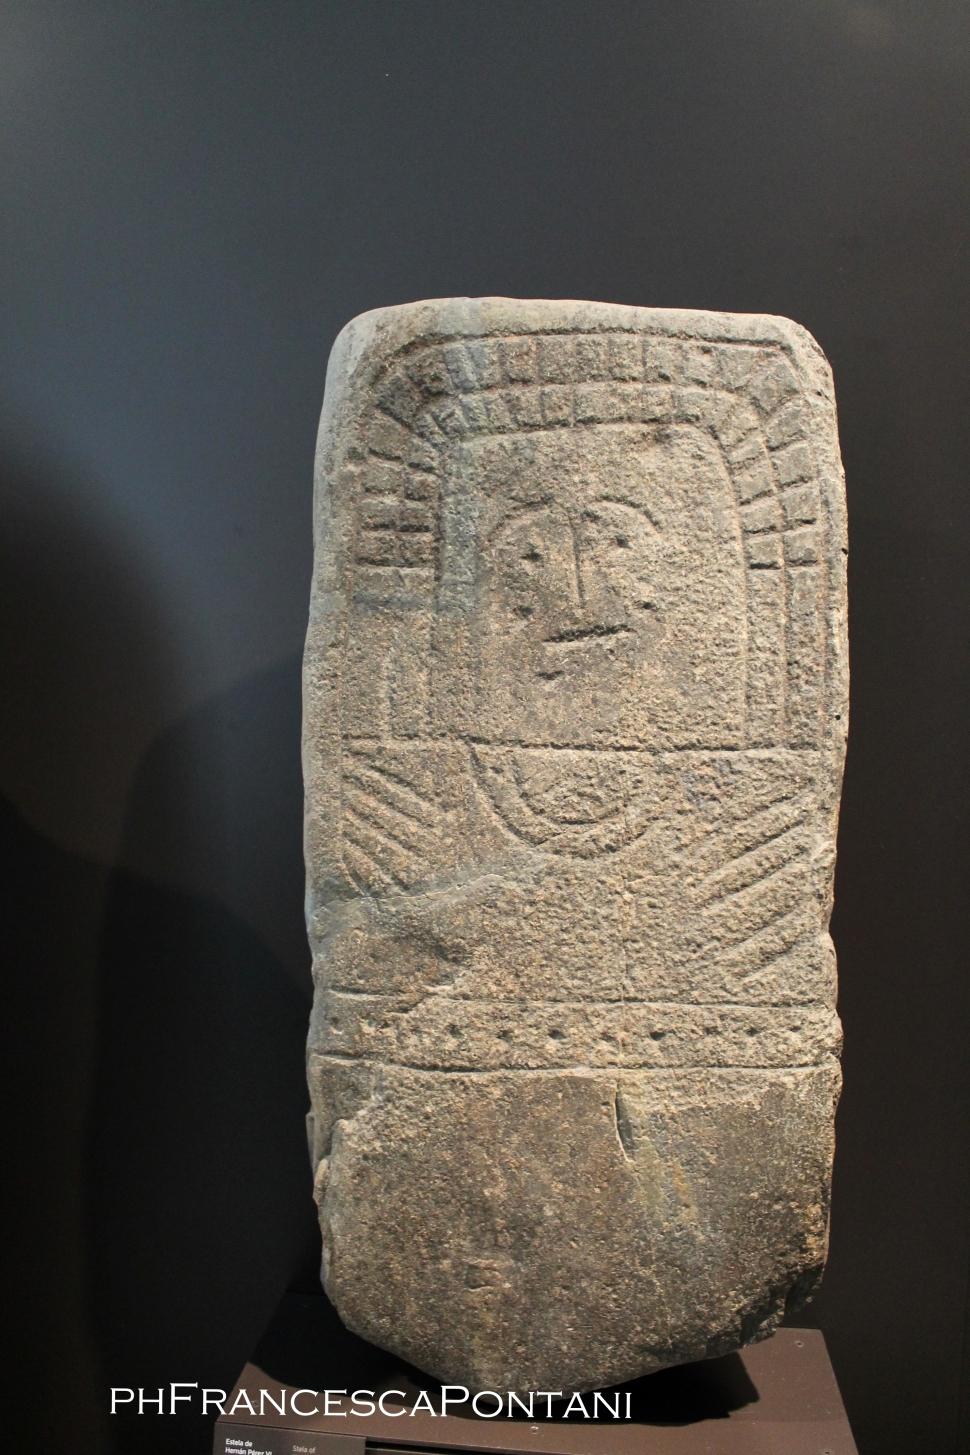 madrid_museo_archeologico_preistoria_stele_femminile